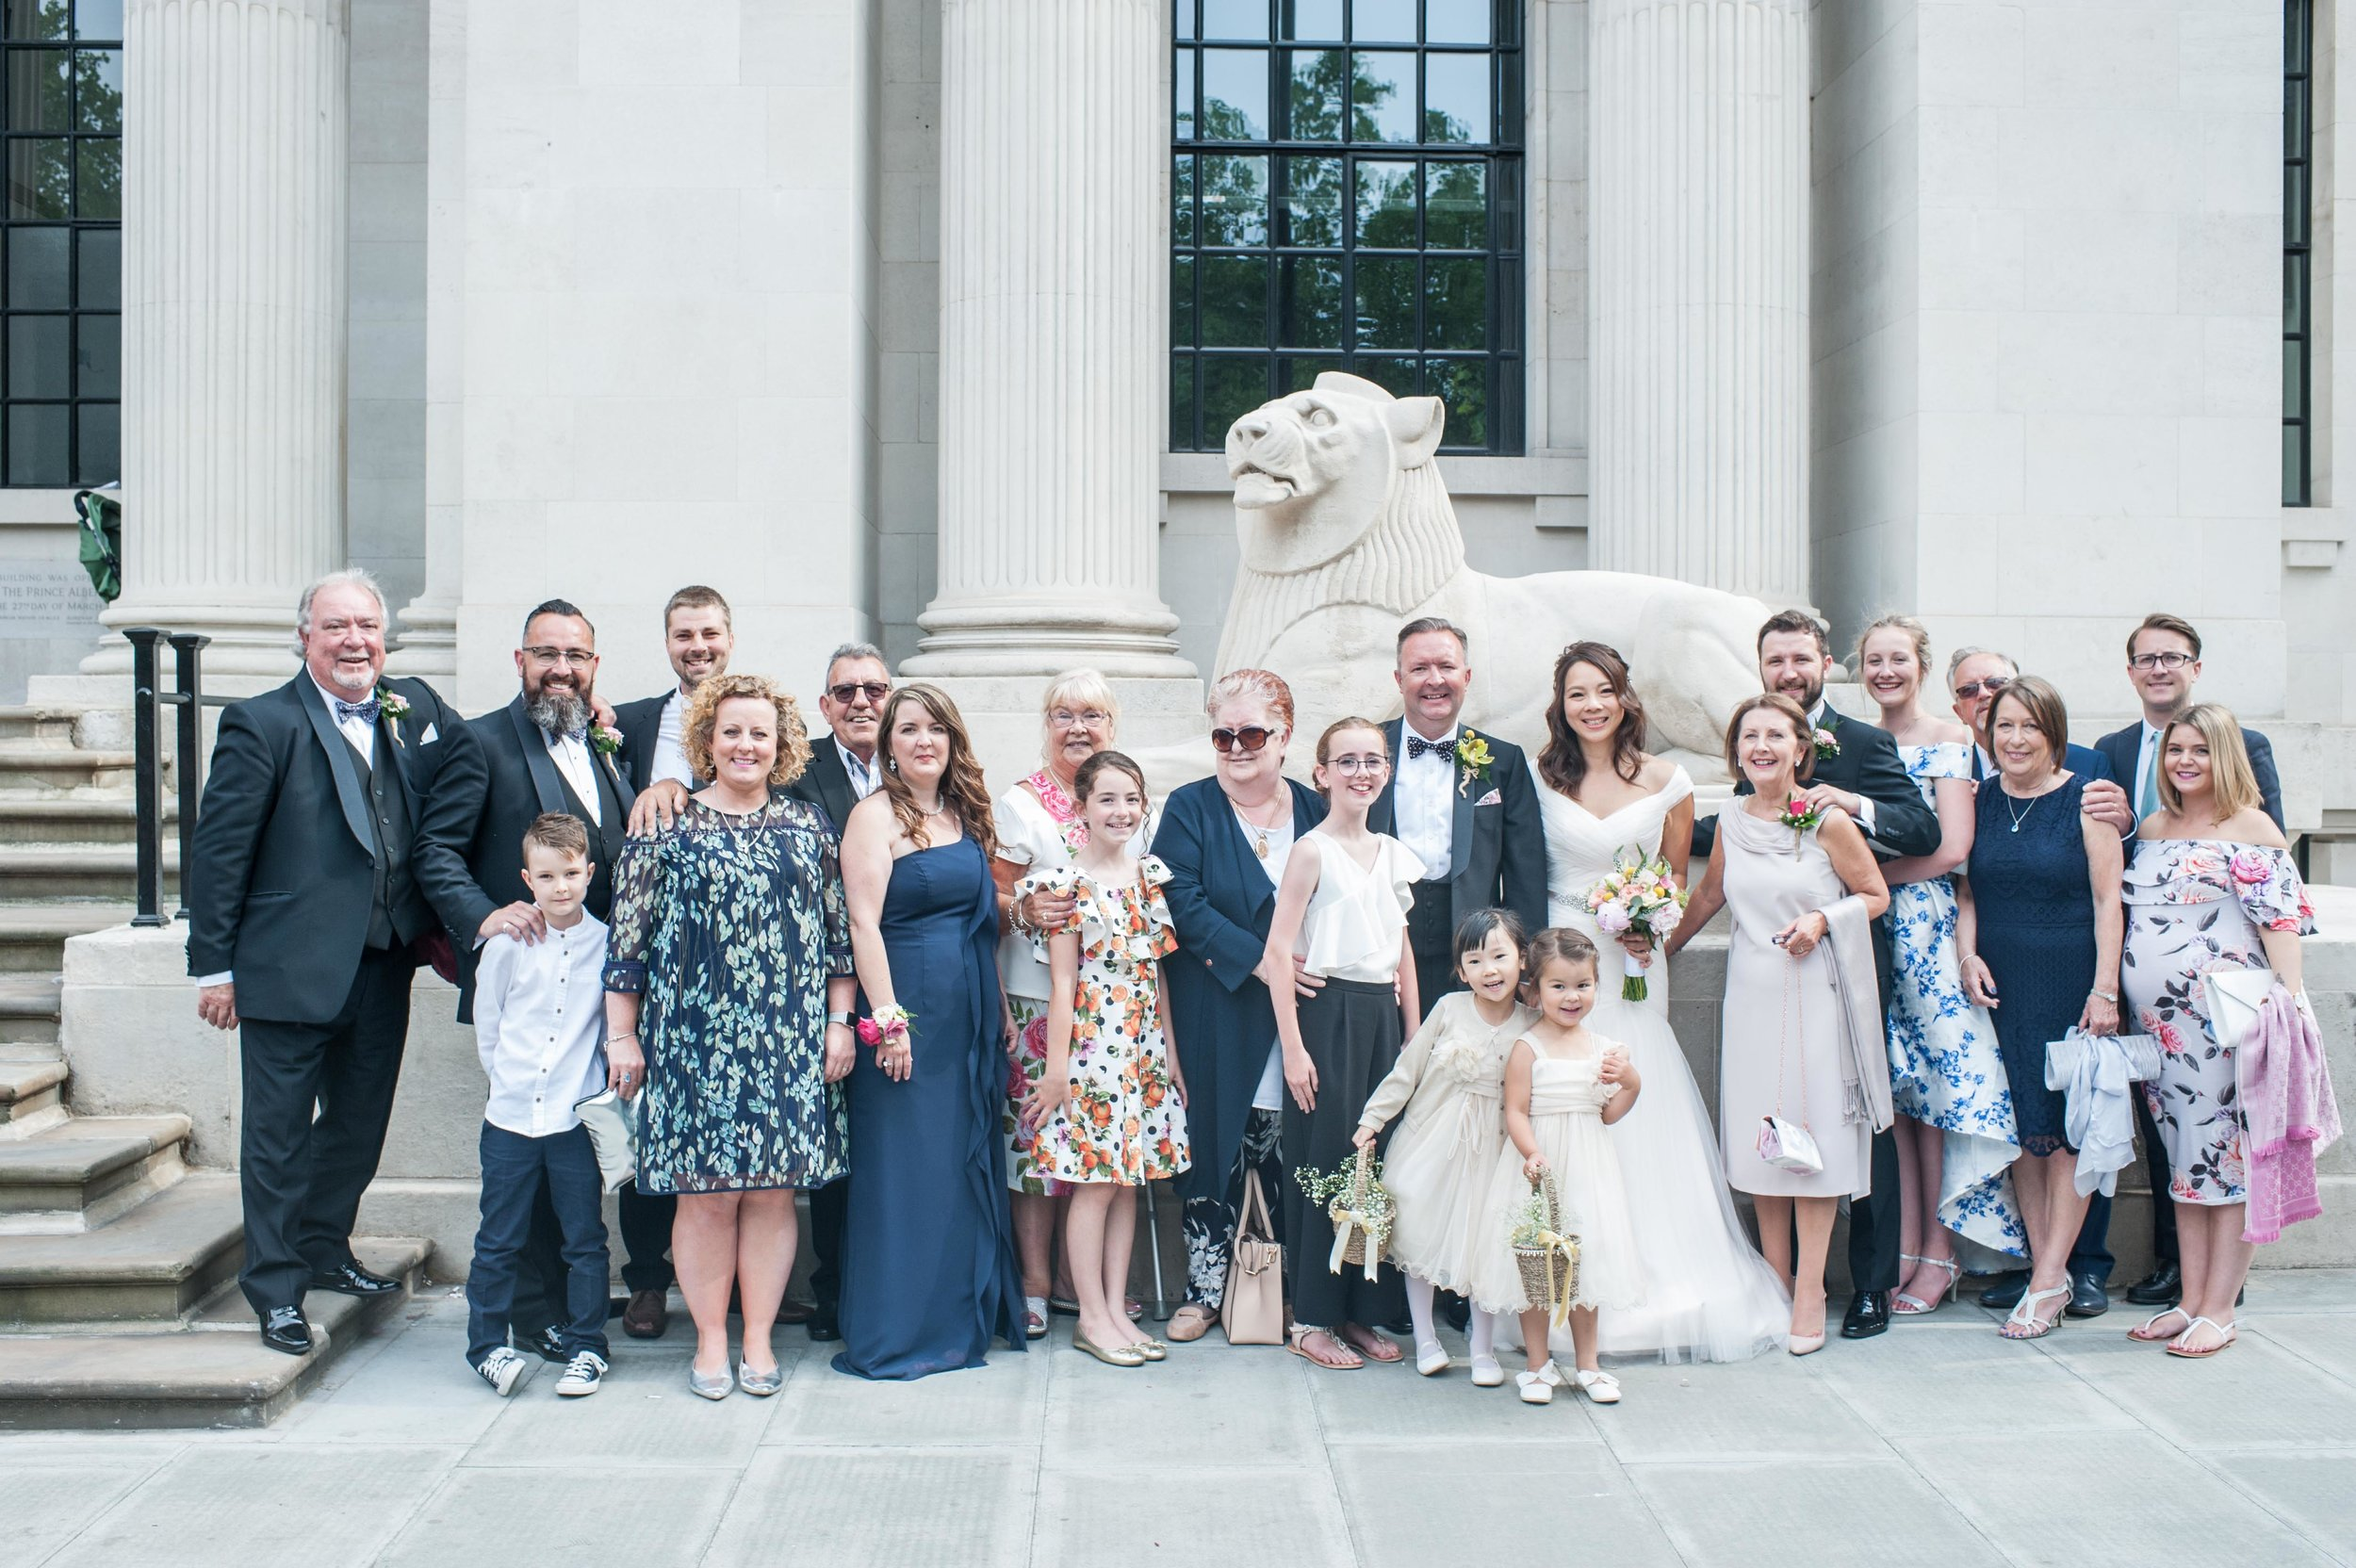 D&M_Marylebone Town Hall Wedding (137 of 239).jpg